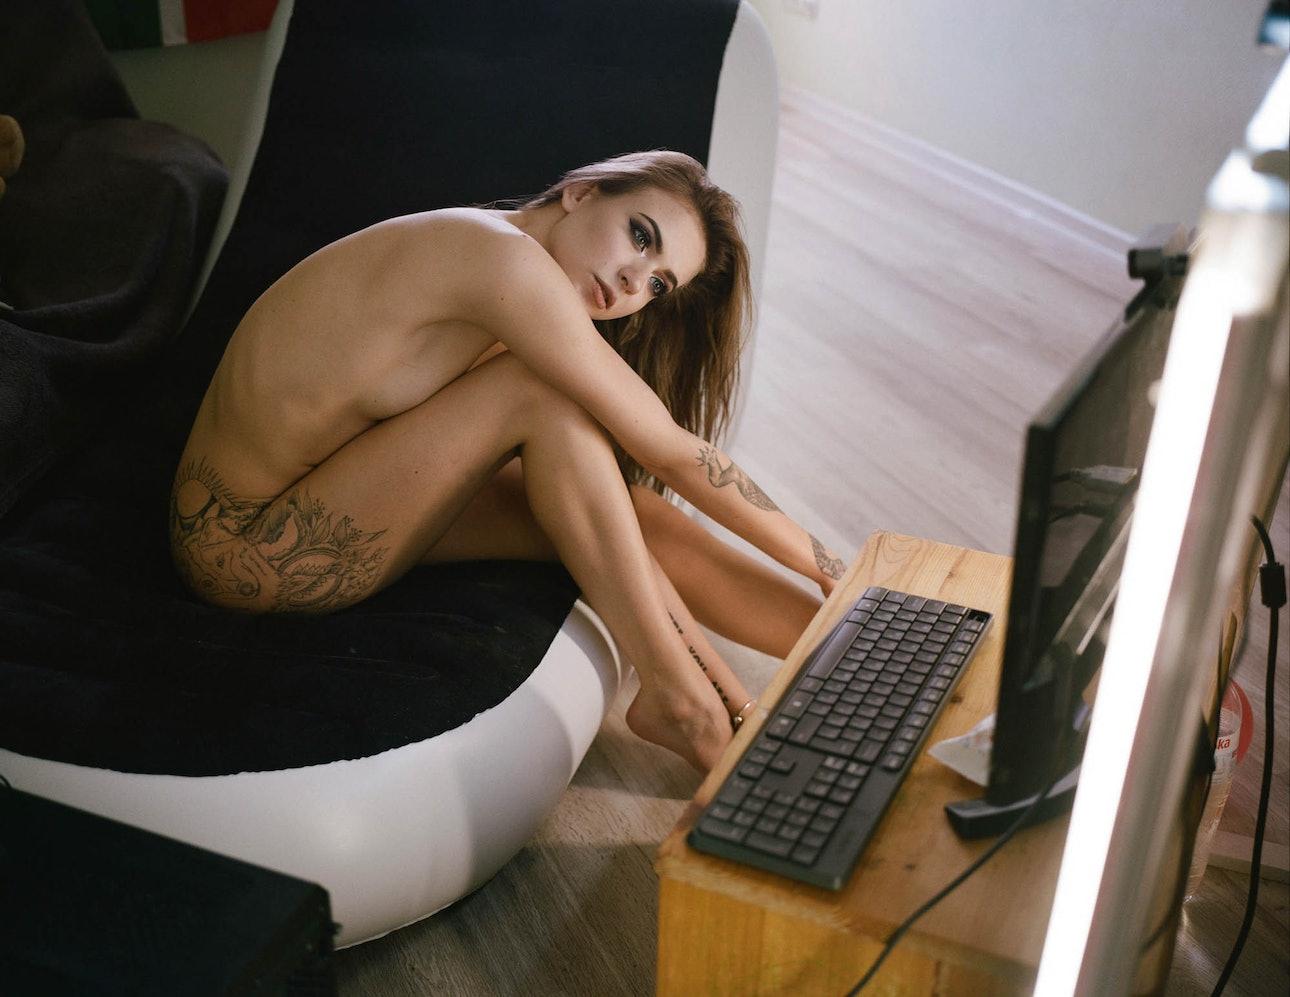 19_ira_lupu_webcam